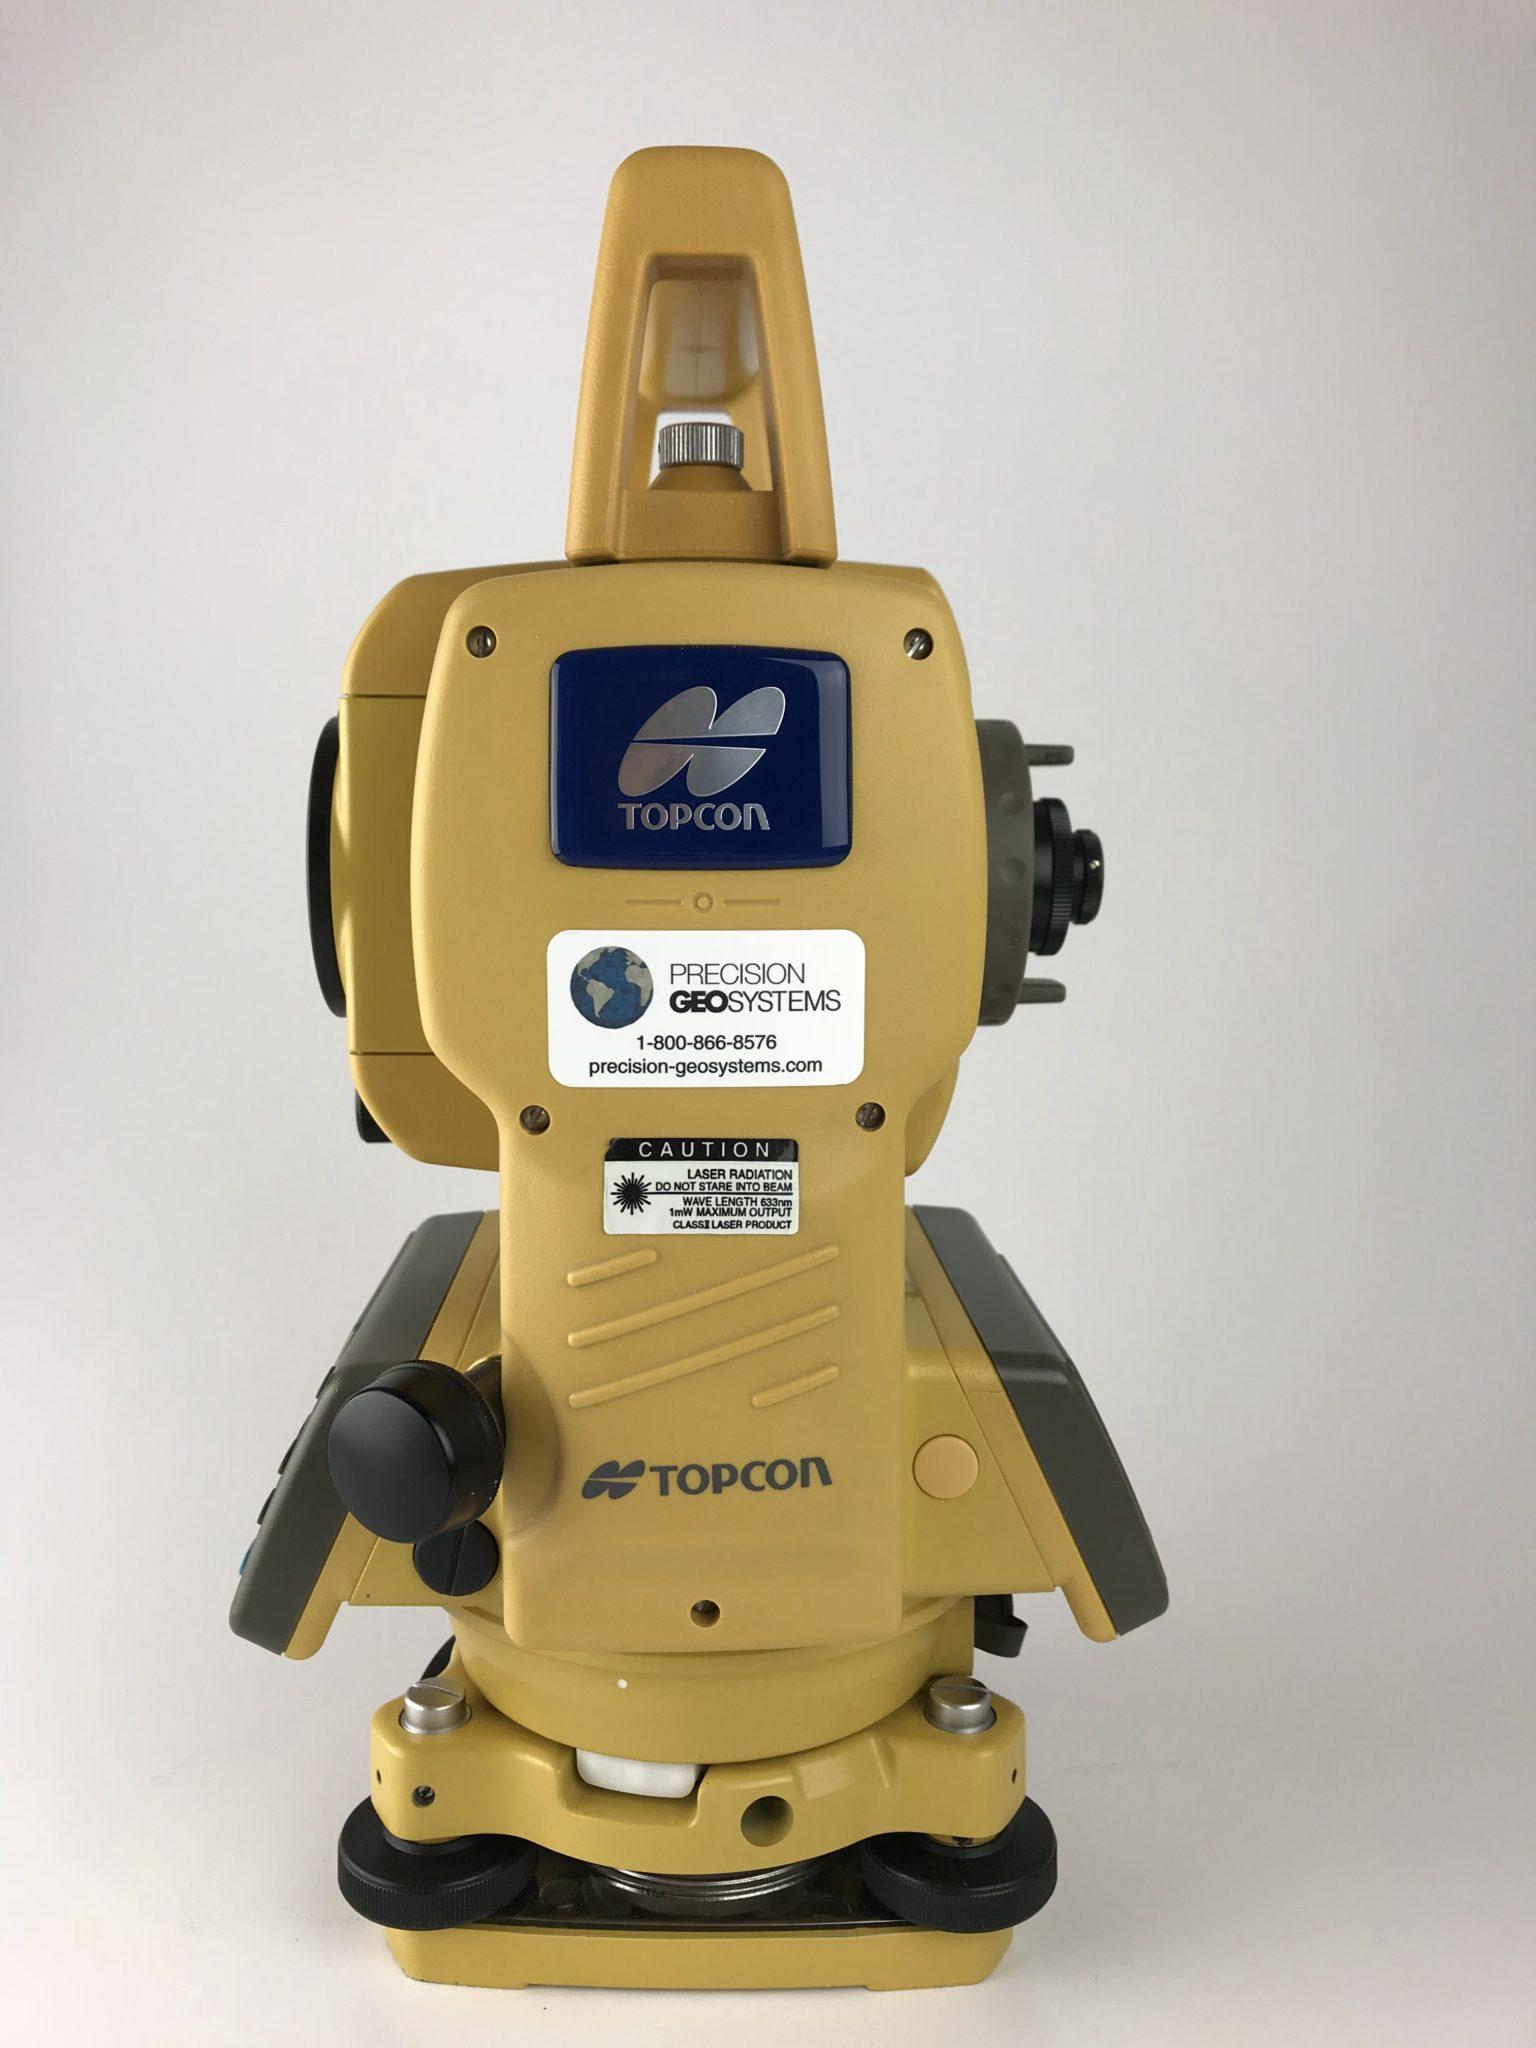 Topcon Gts 235w 5 Total Station W Bluetooth Precision